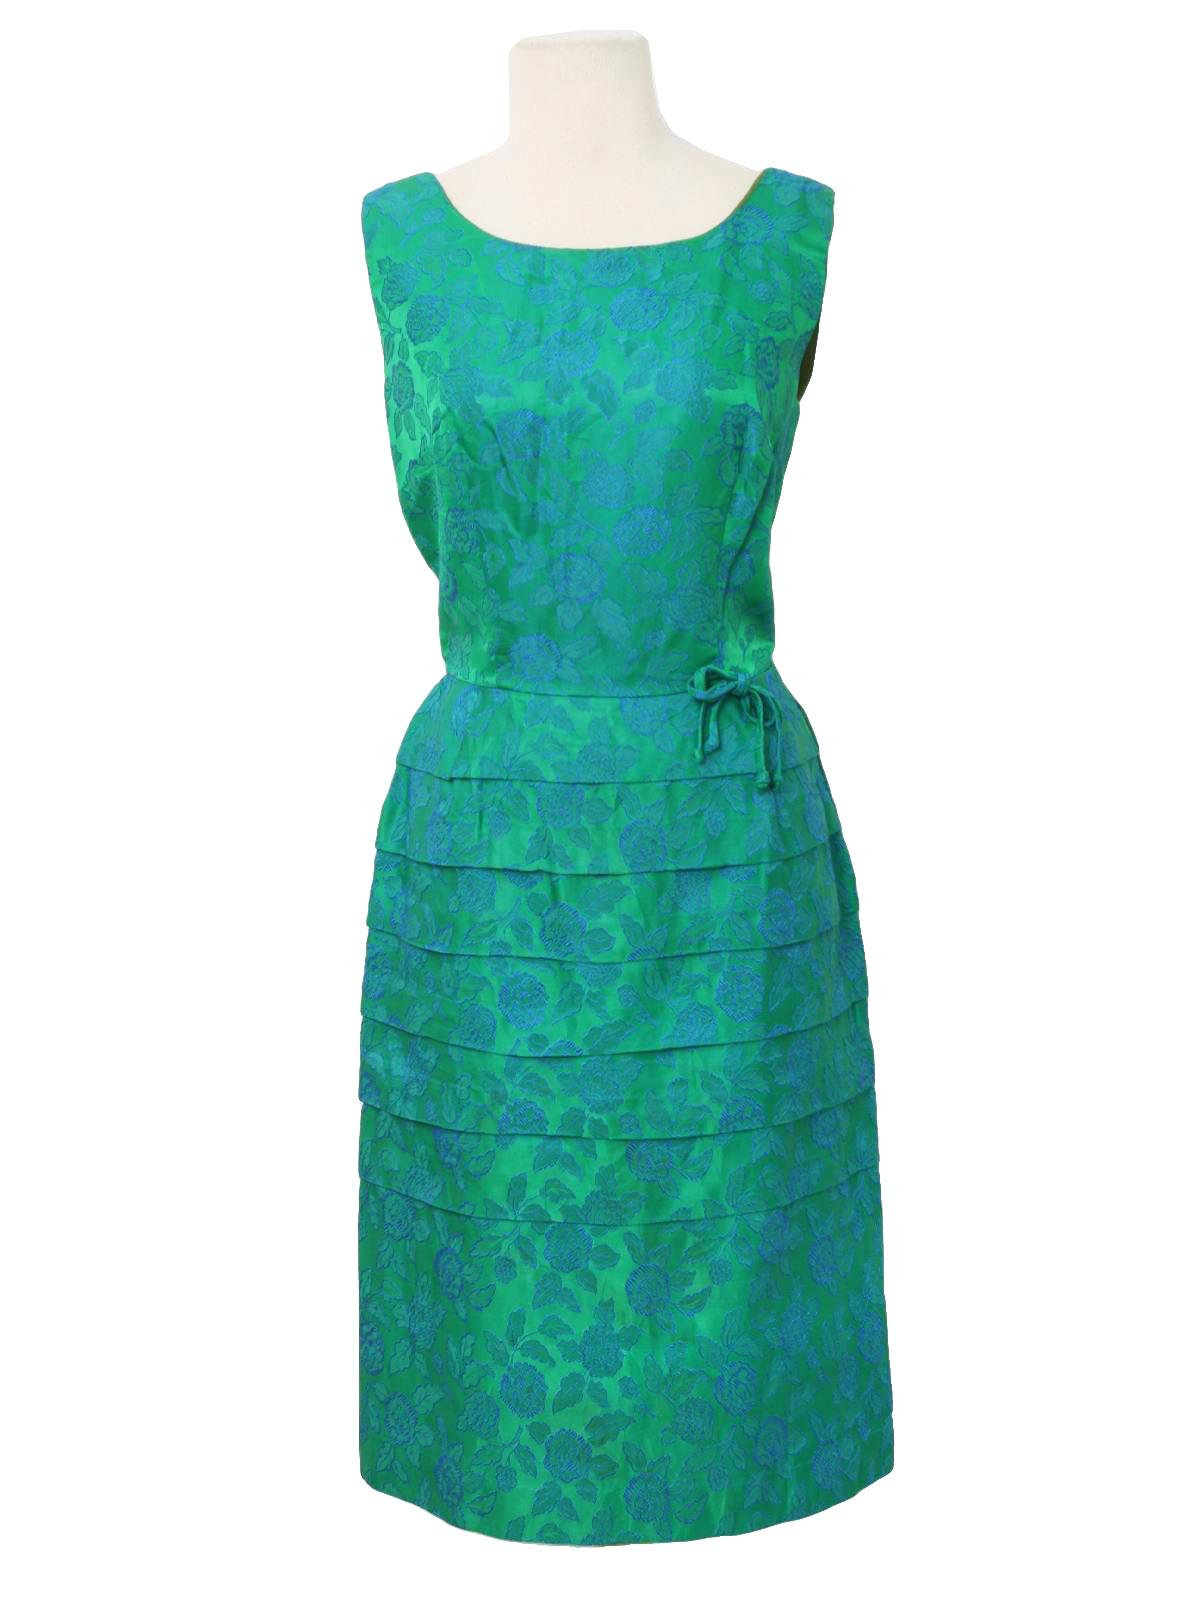 Green evening dress e2015 cheap prom dresses wedding dresses